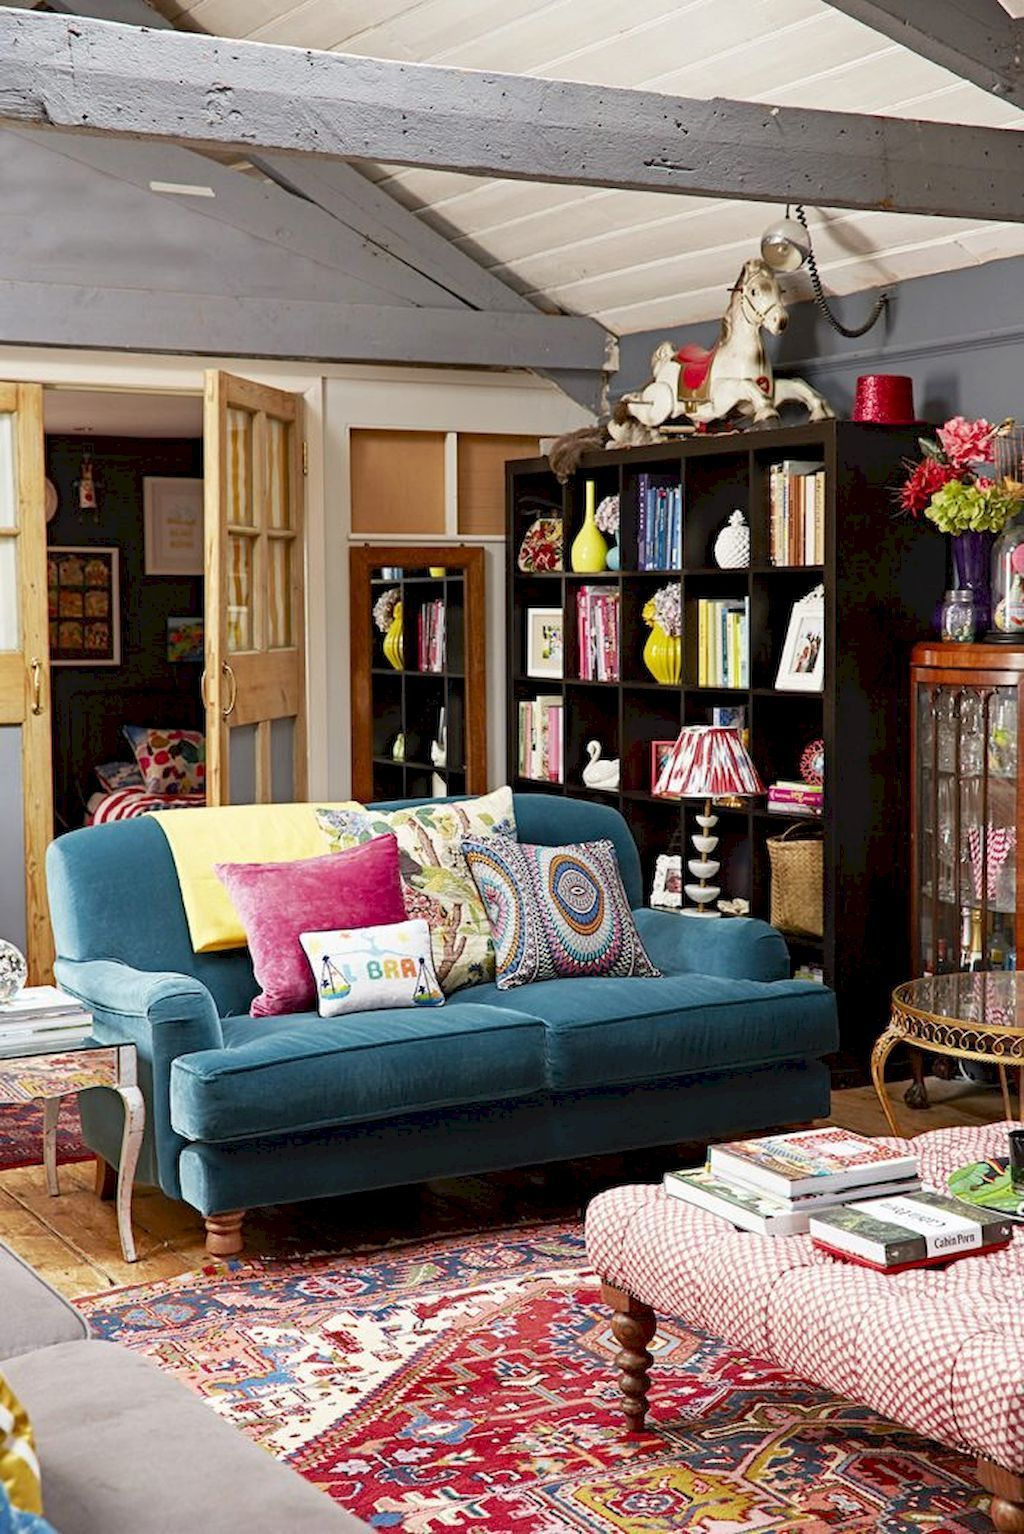 60 Gracefulness Bohemian Living Room Design And Decor Ideas Eclectic Living Room Living Room Decor Eclectic Living Room Modern